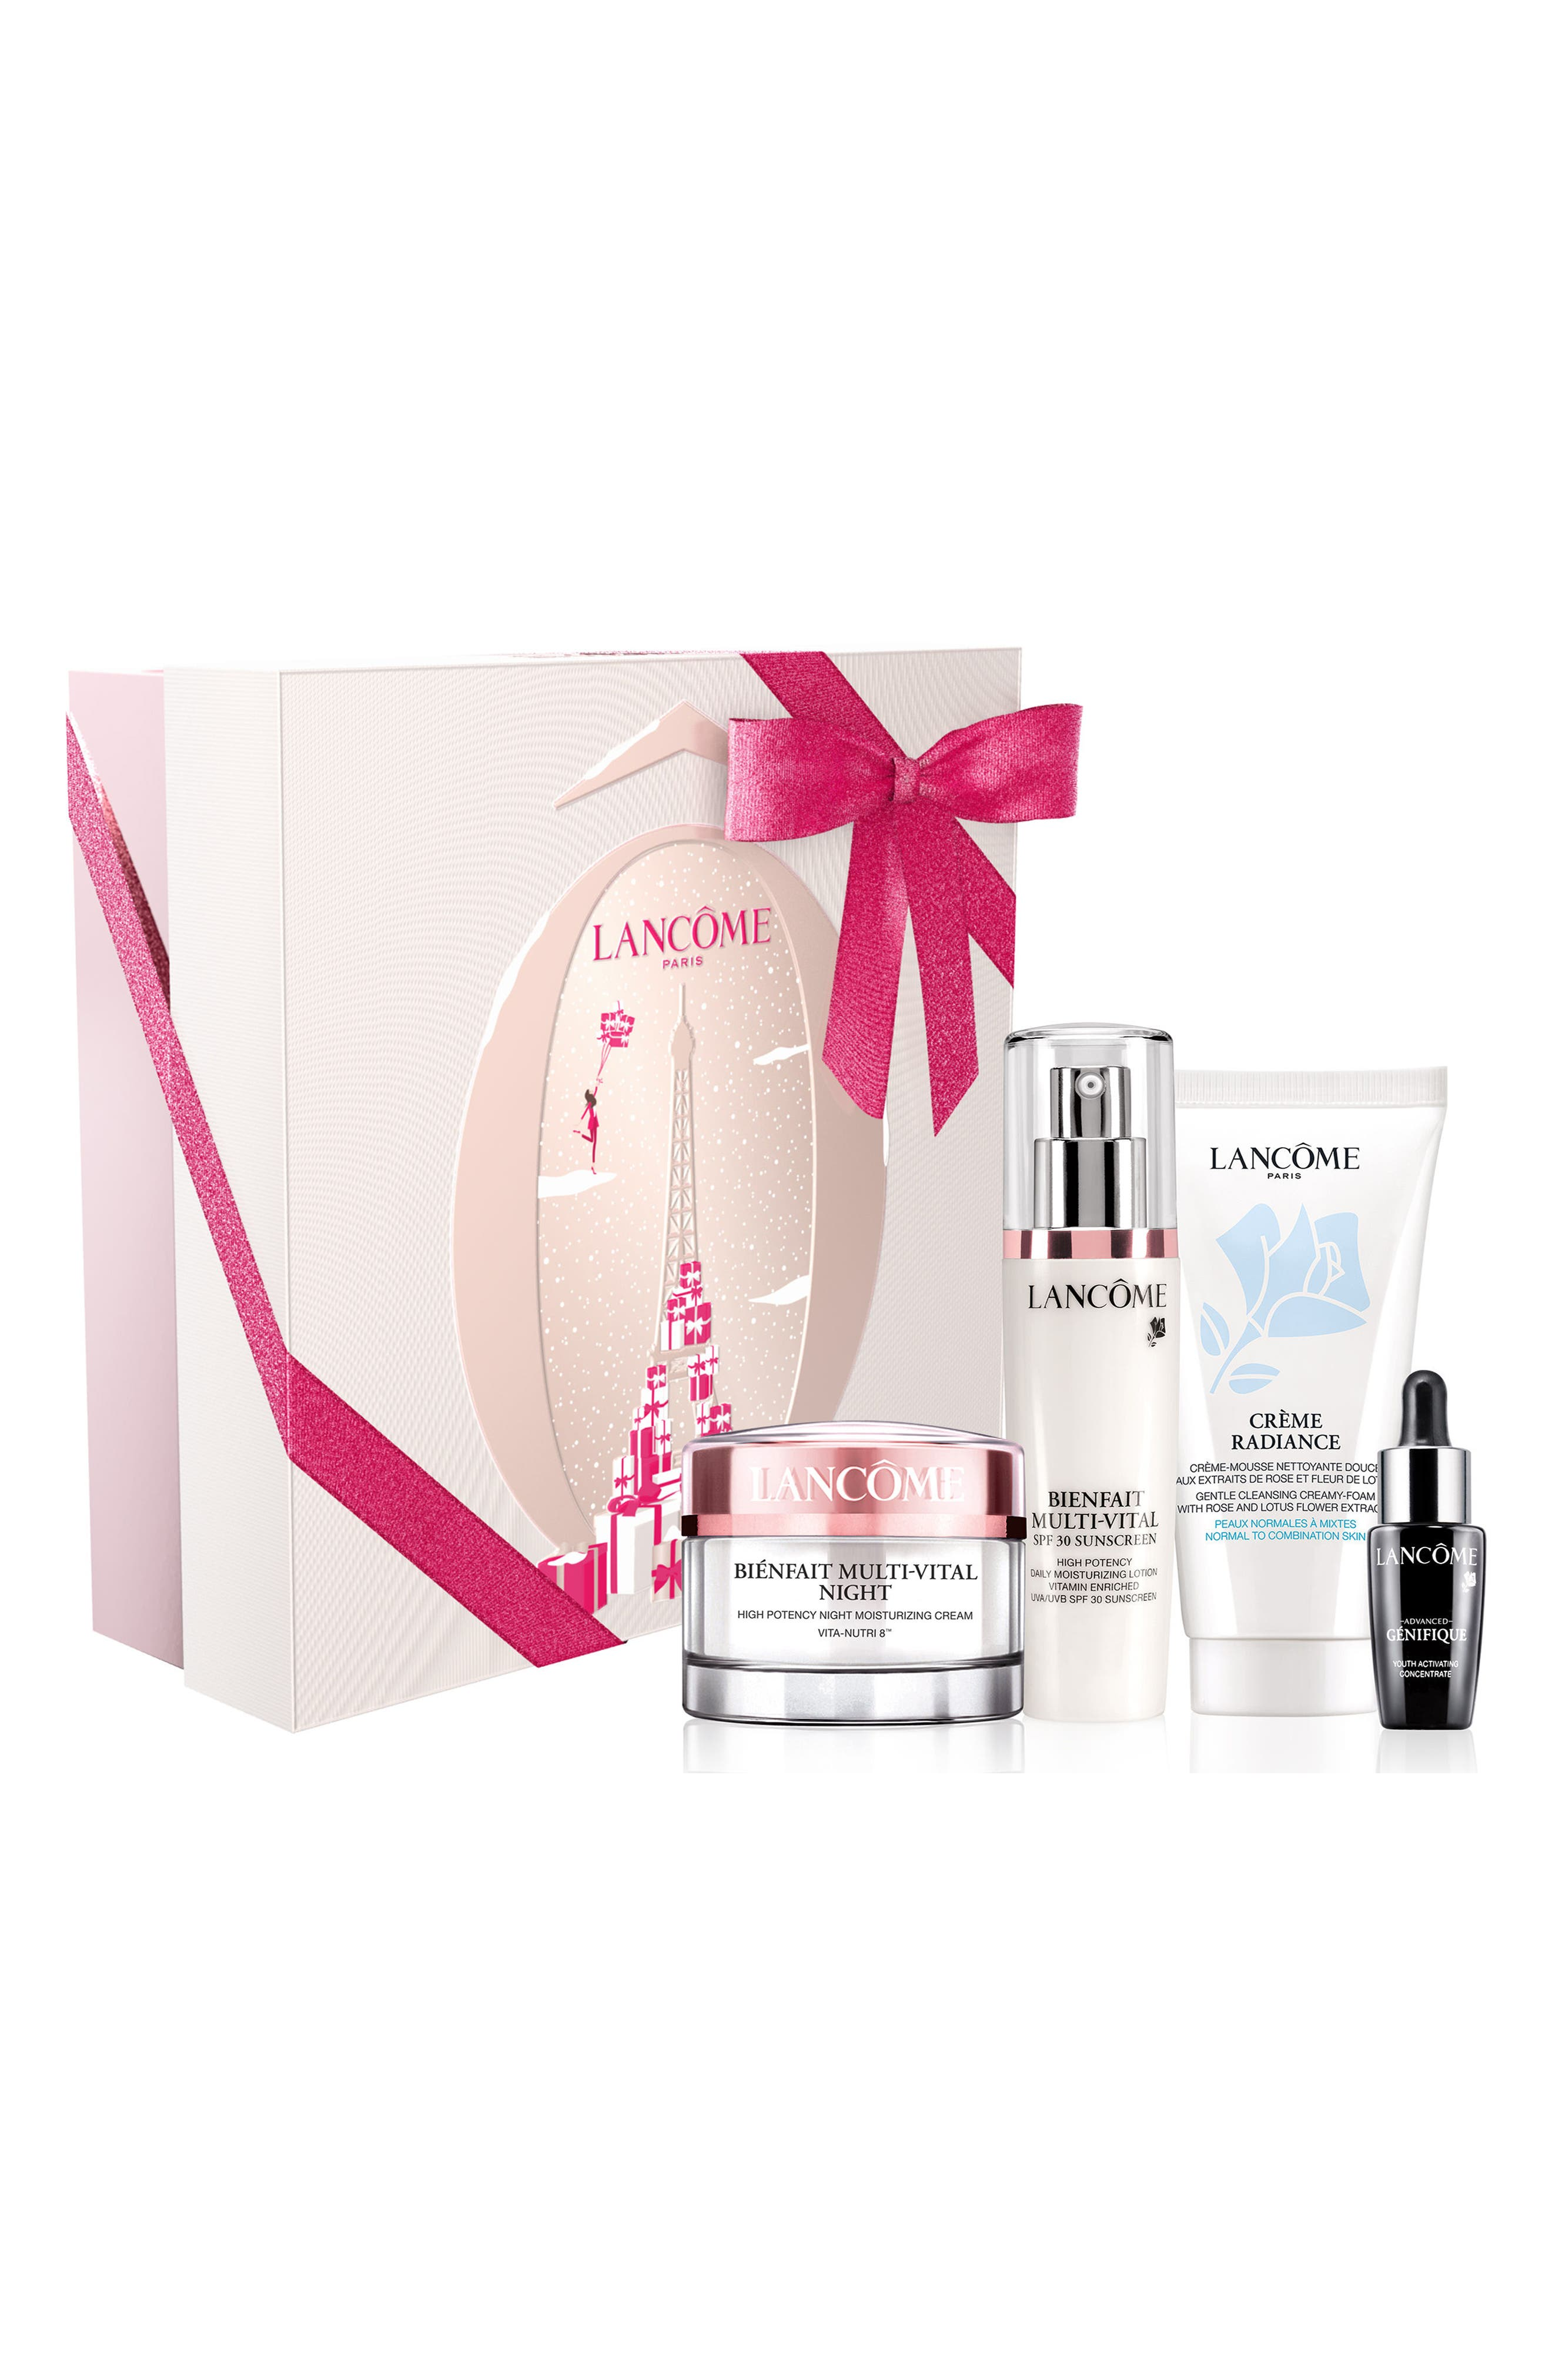 Main Image - Lancôme Bienfait Multi-Vital Collection for Normal/Combination Skin Types ($132.50 Value)